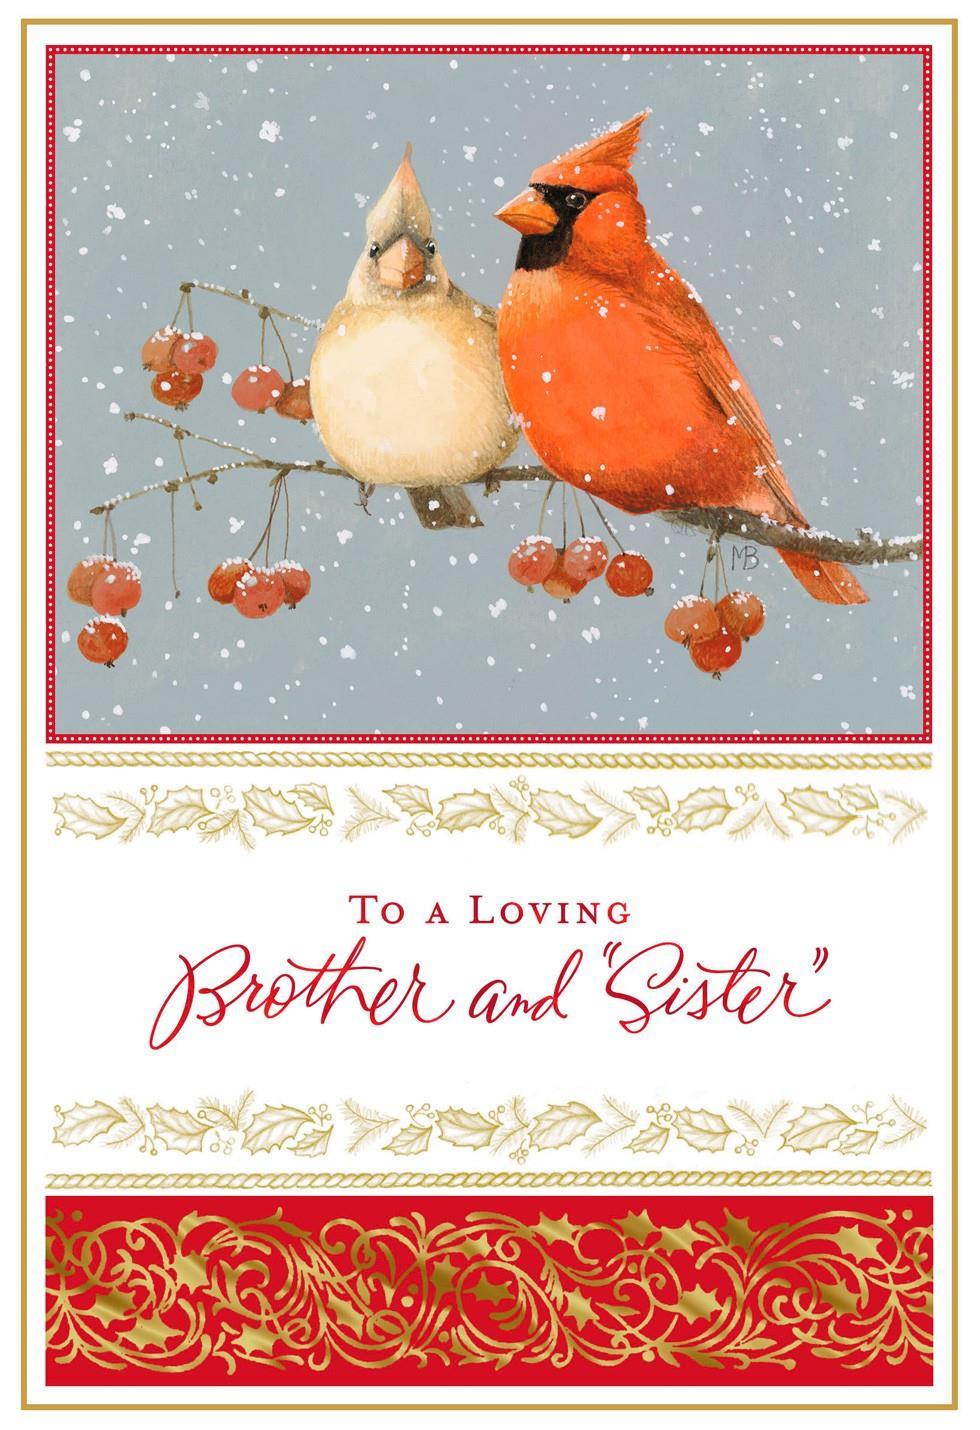 Marjolein bastin cardinals christmas card for brother and wife marjolein bastin cardinals christmas card for brother and wife kristyandbryce Choice Image